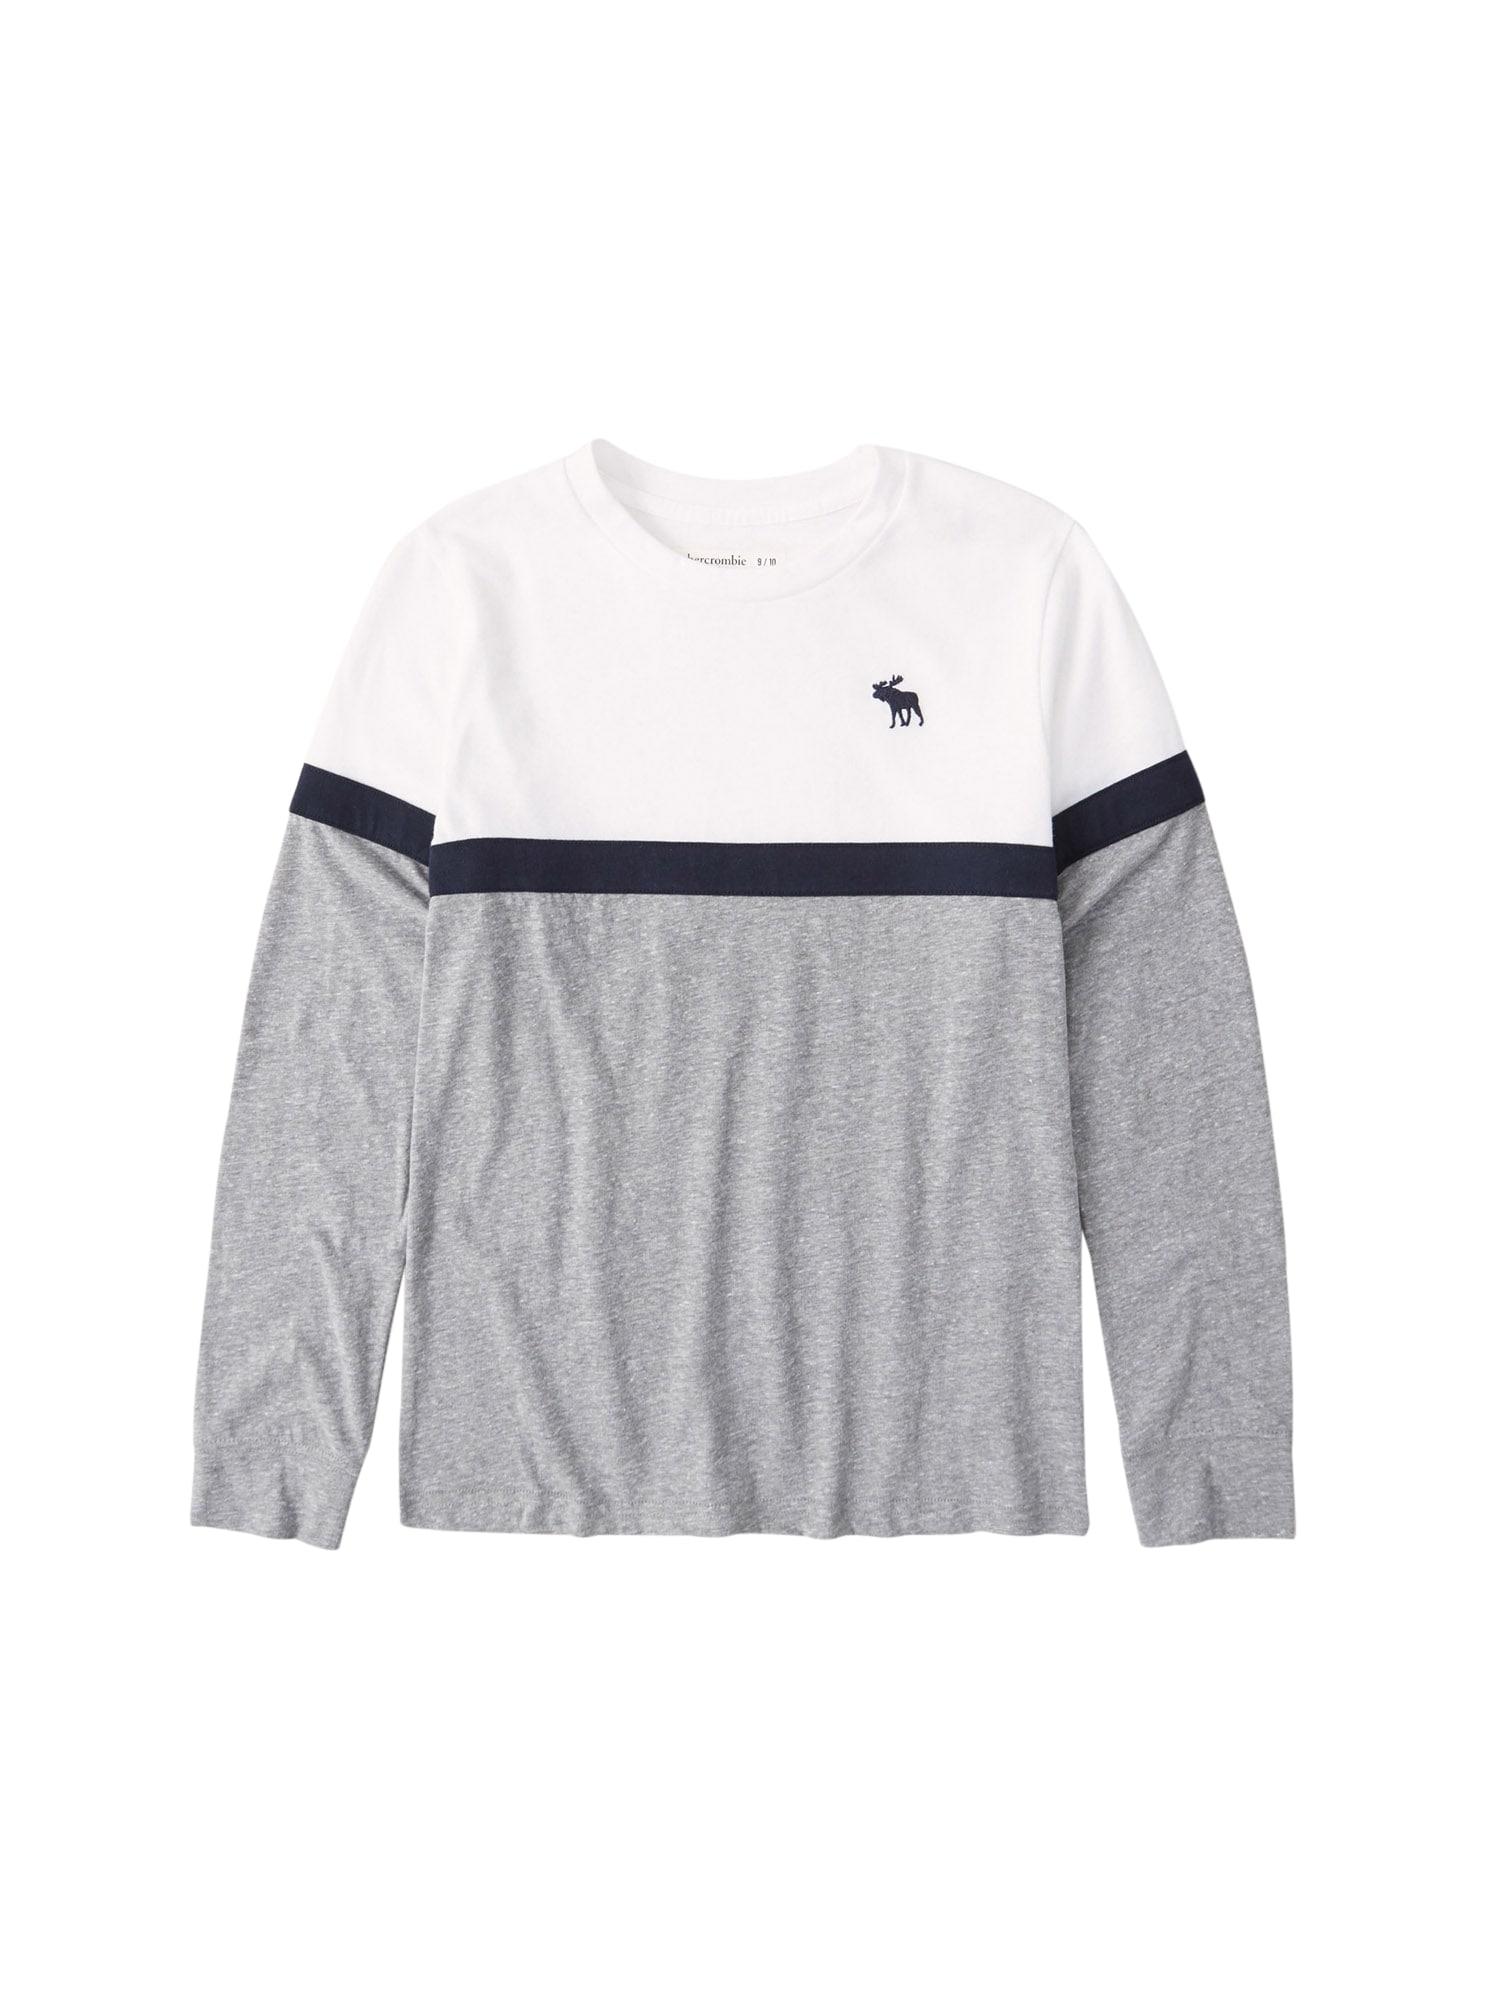 Abercrombie & Fitch Marškinėliai balta / tamsiai mėlyna / pilka